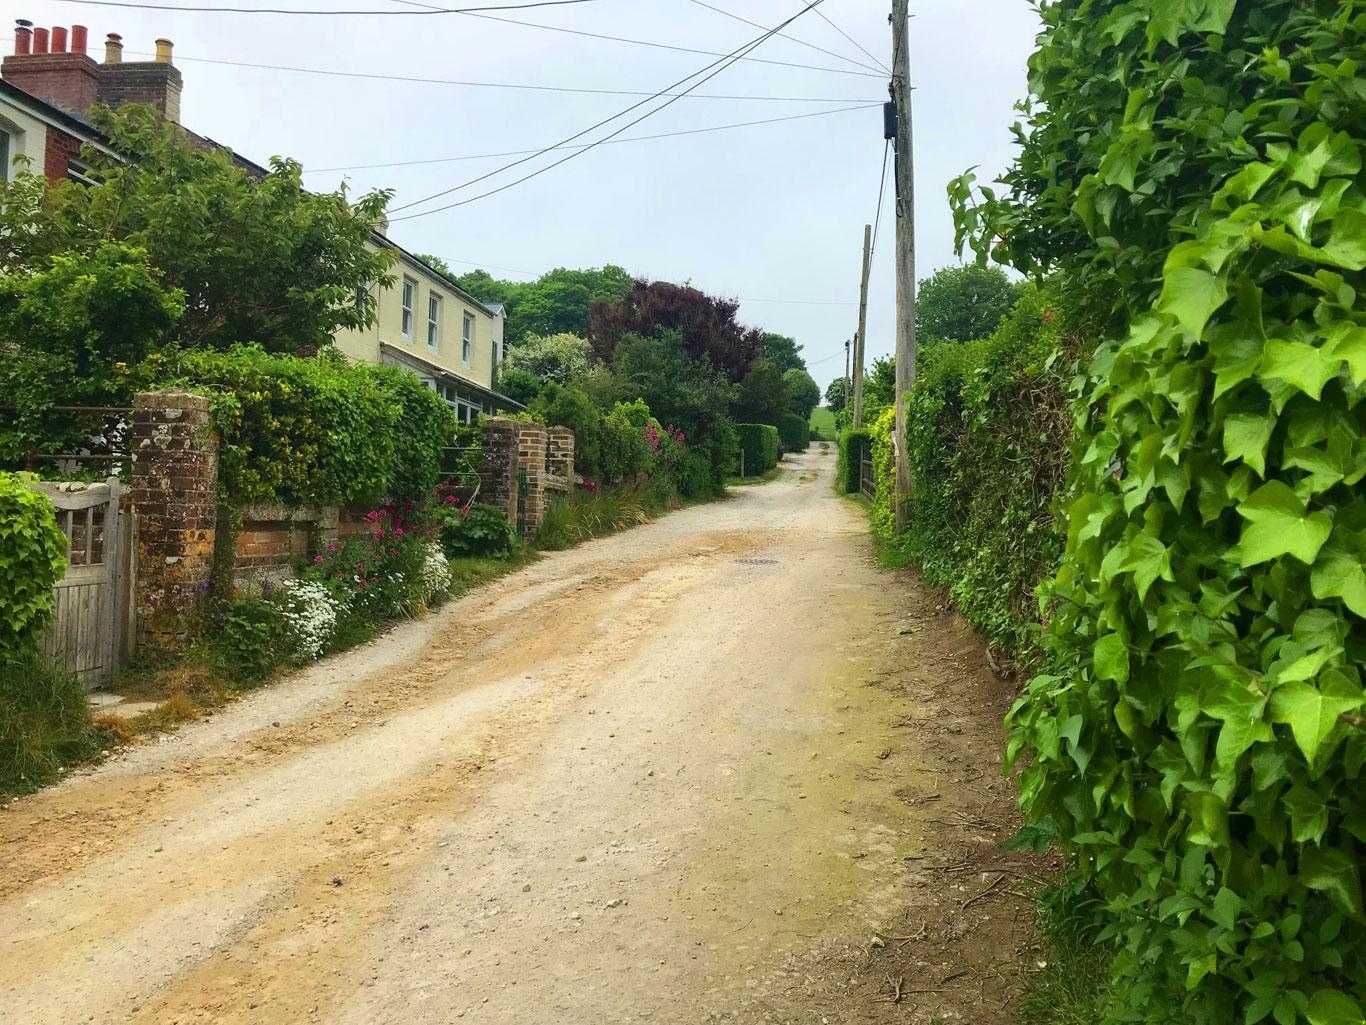 Bindon Road